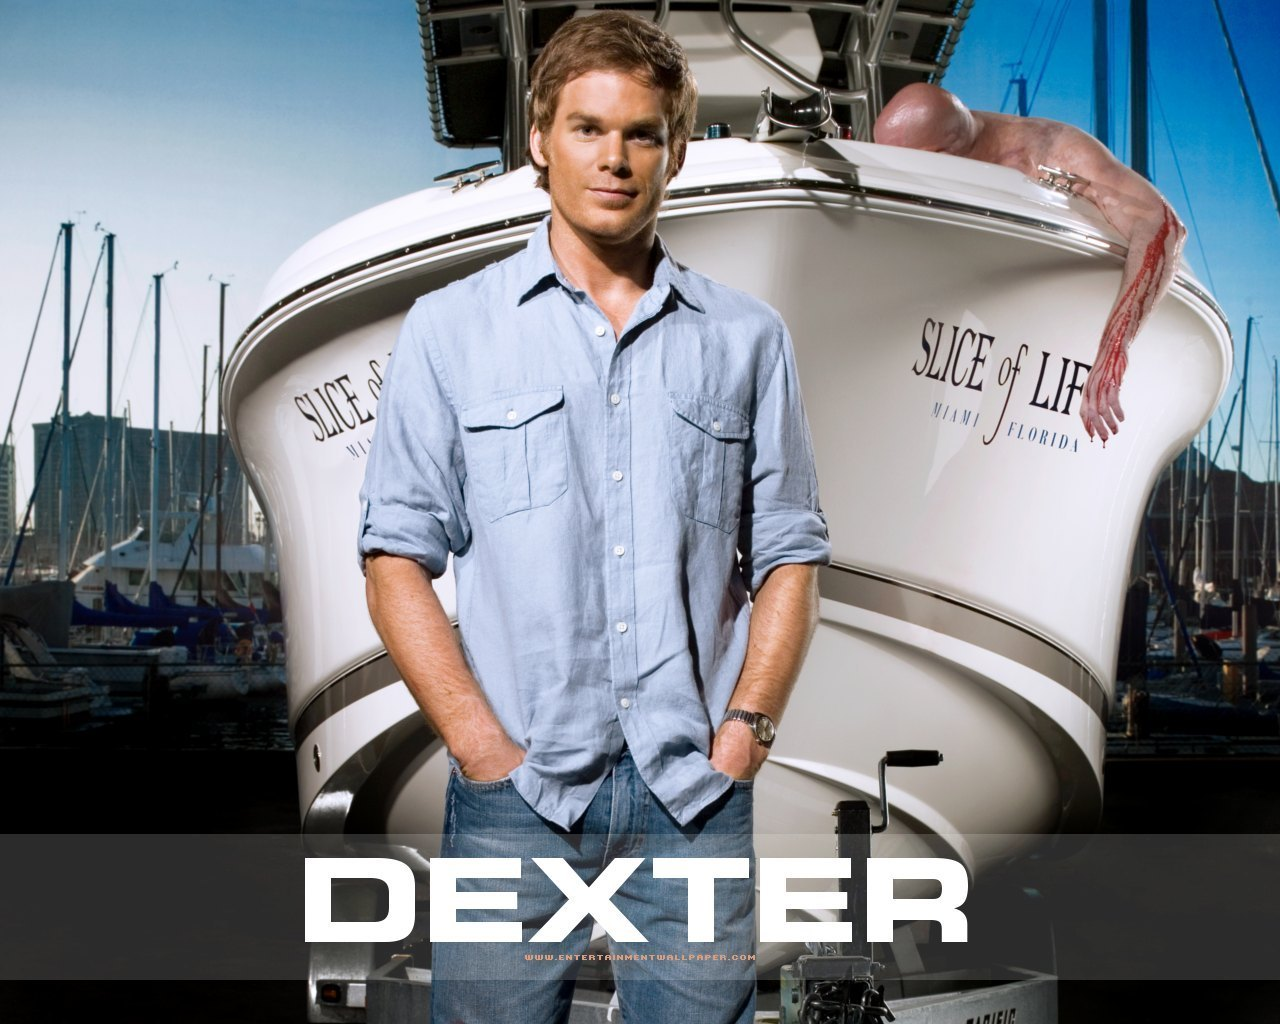 http://4.bp.blogspot.com/_vSI7YskDmM4/TOavZ-o3kpI/AAAAAAAAAXY/nh5eo208J-4/s1600/Dexter-dexter-2953319-1280-1024.jpg